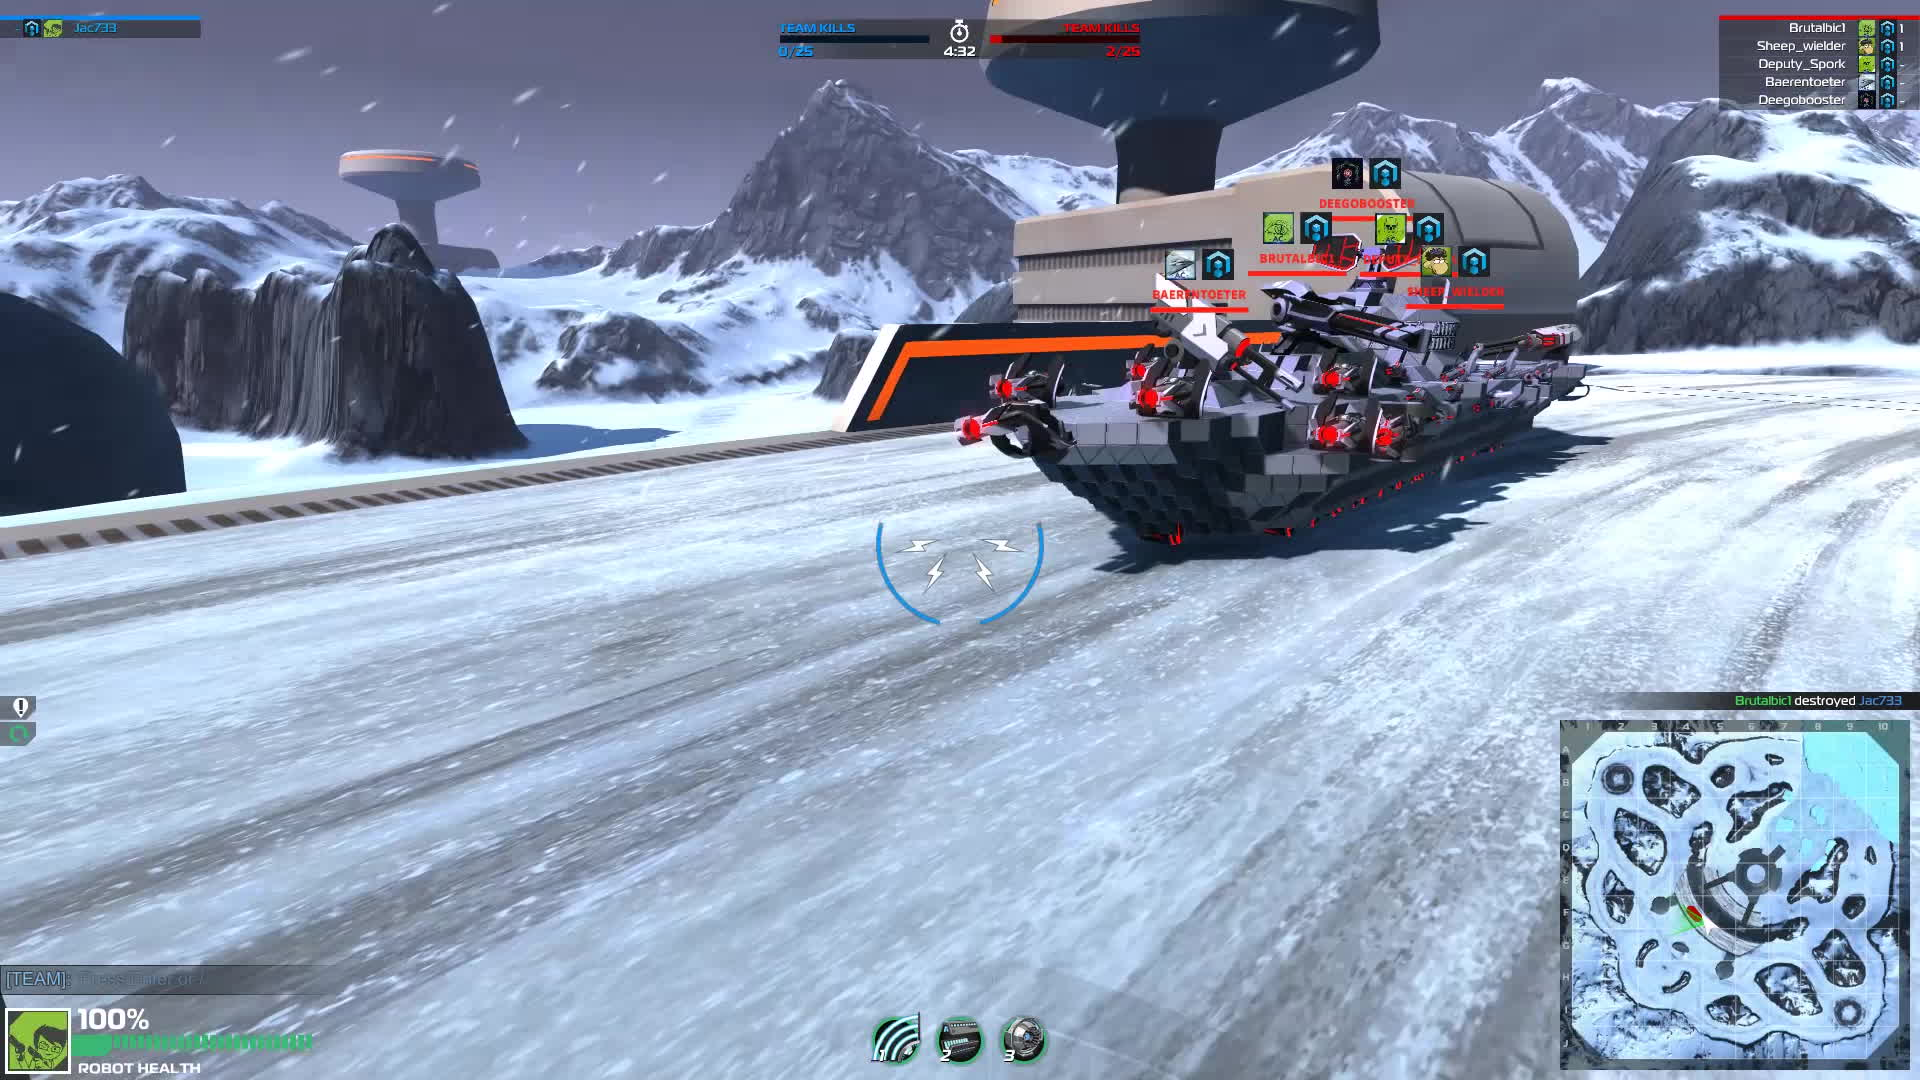 Robocraft, Battleship by Jac733 GIFs